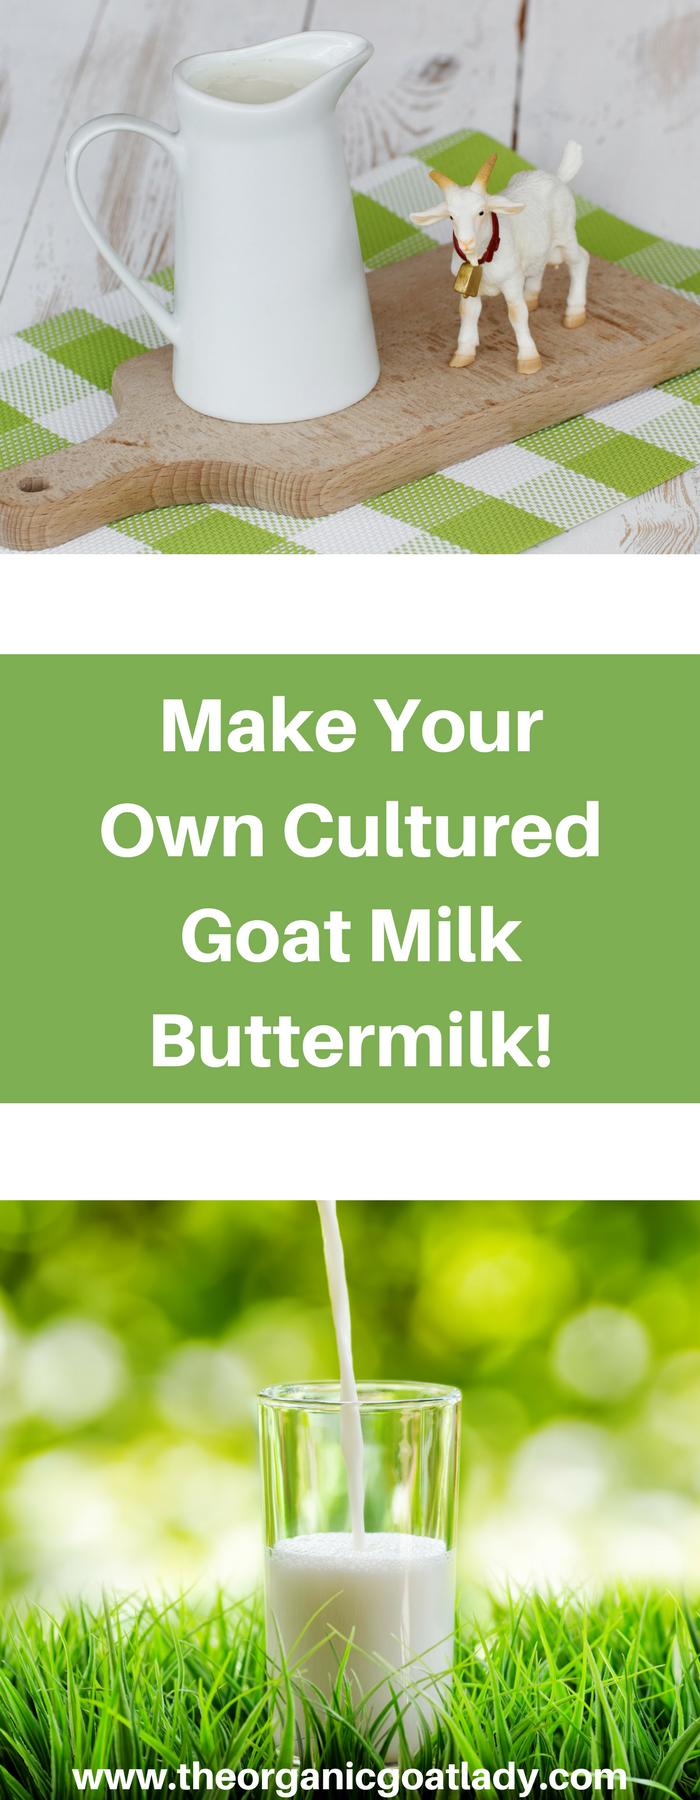 Make Your Own Cultured Goat Milk Buttermilk!